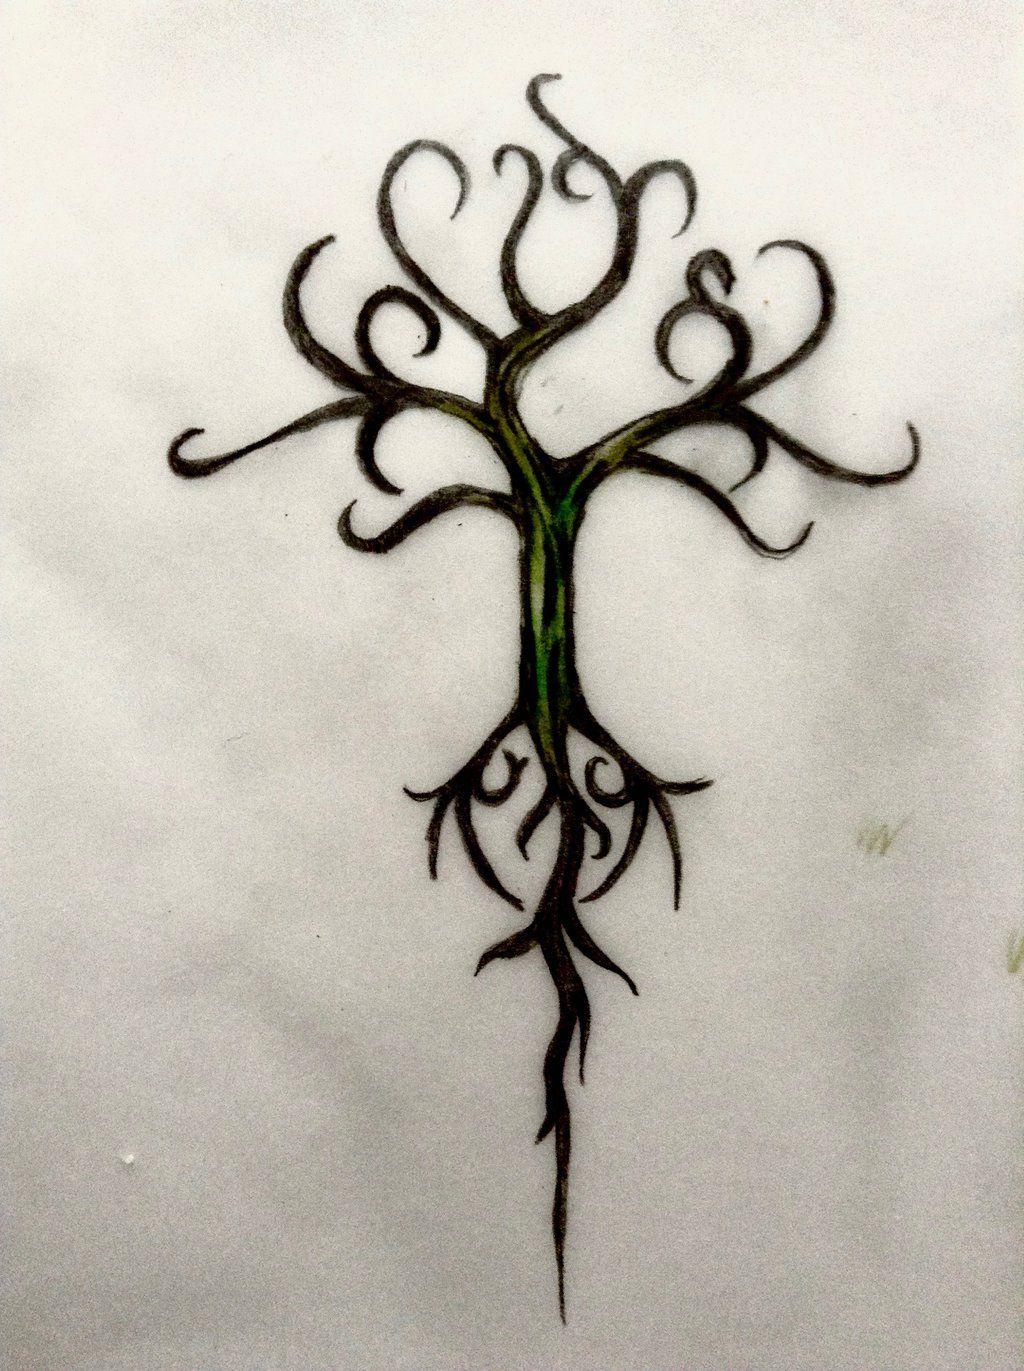 Yggdrasil Design By Miladybyron Deviantart Com On Deviantart Tats